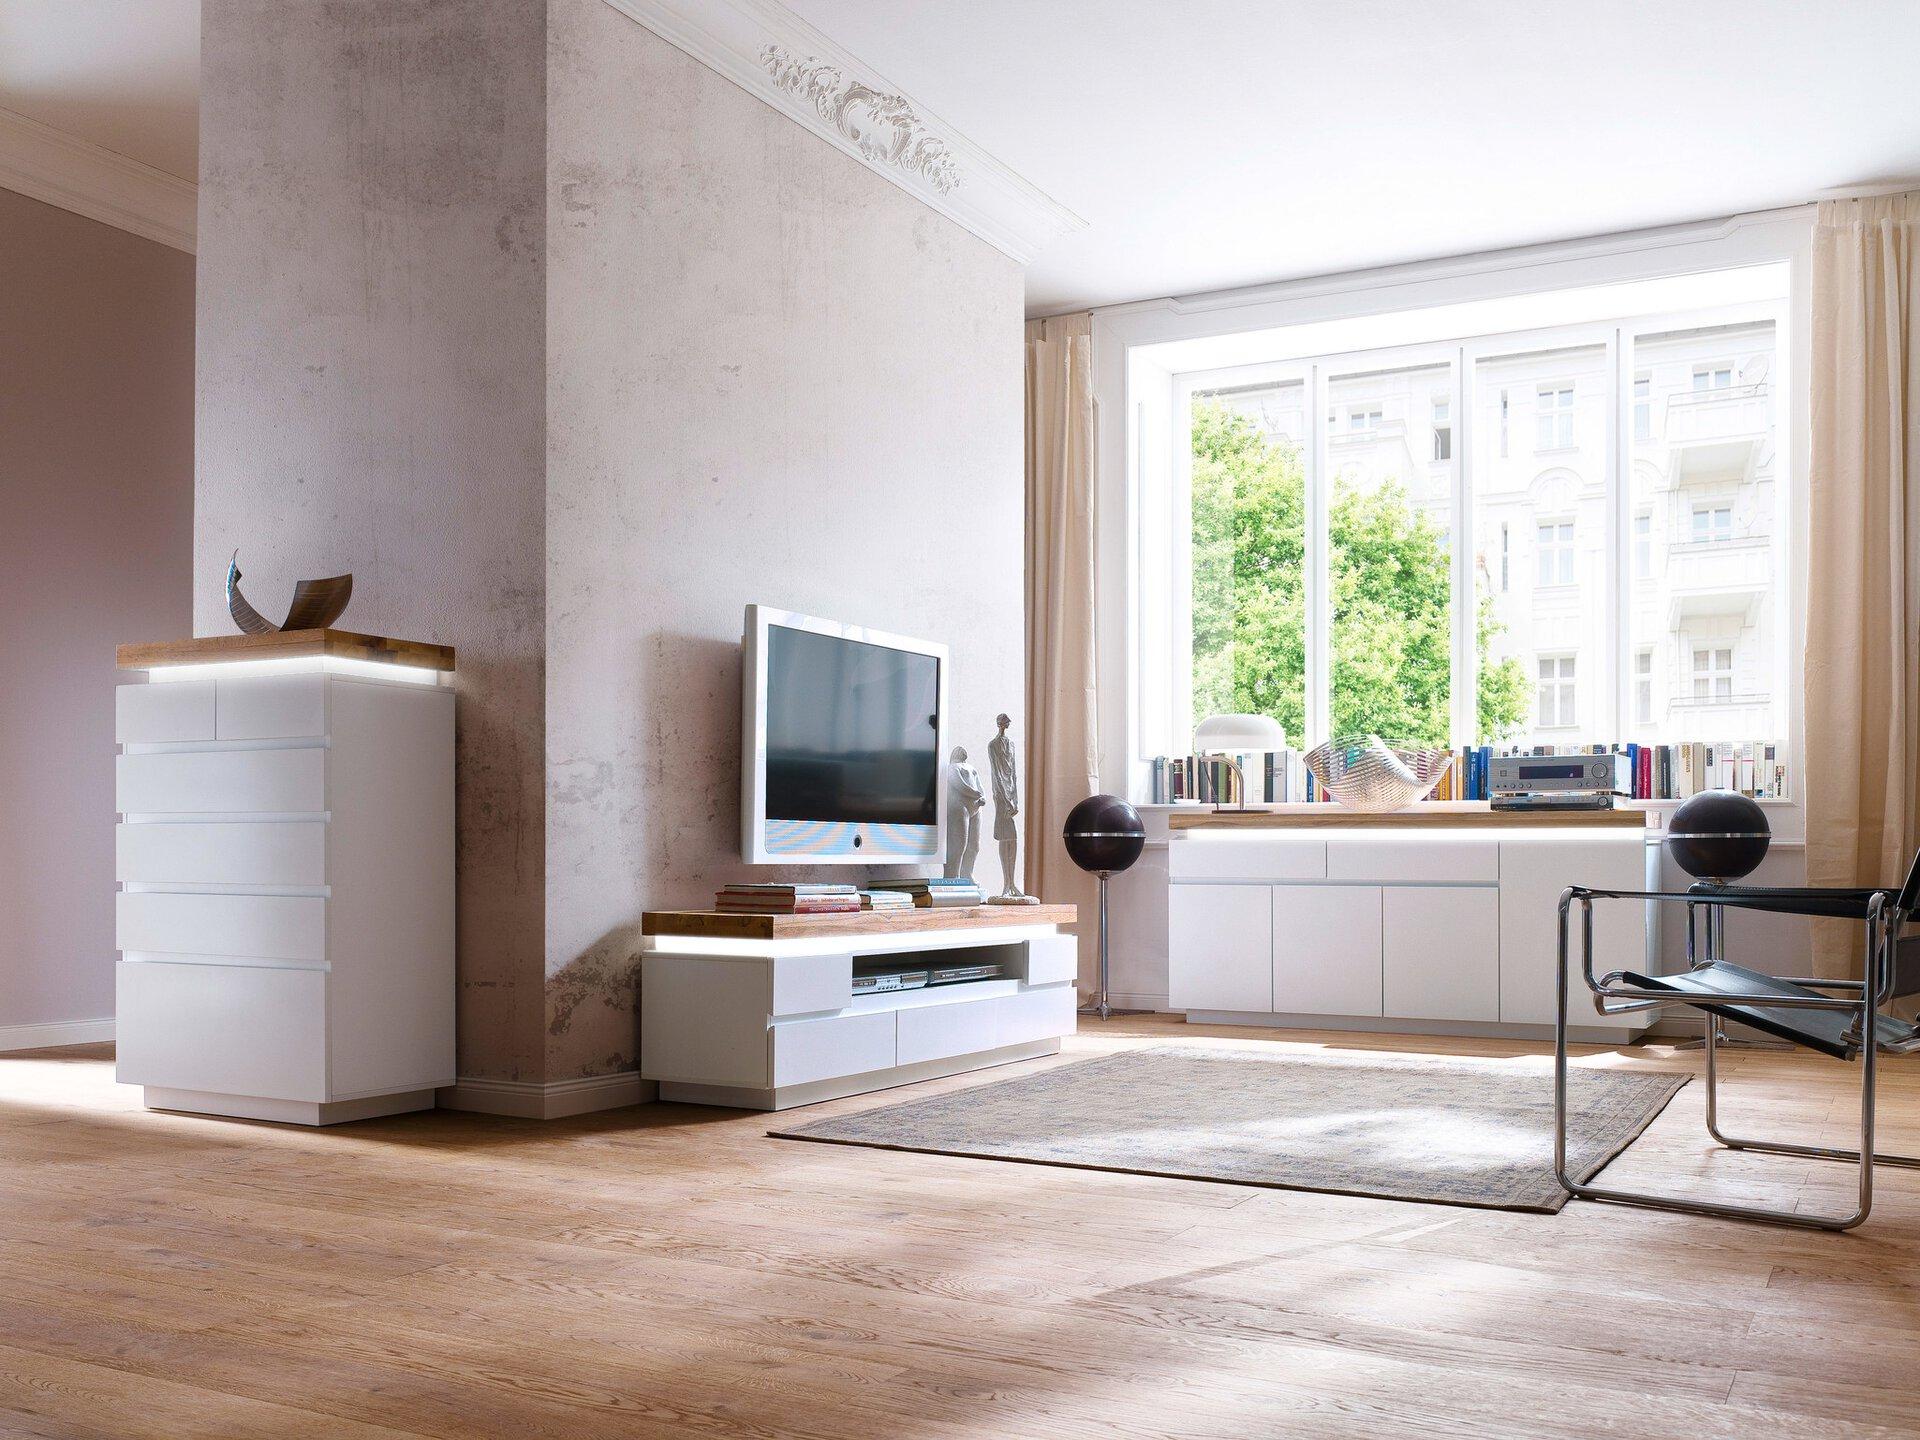 Sideboard ROMINA MCA furniture Holzwerkstoff mehrfarbig 40 x 81 x 150 cm